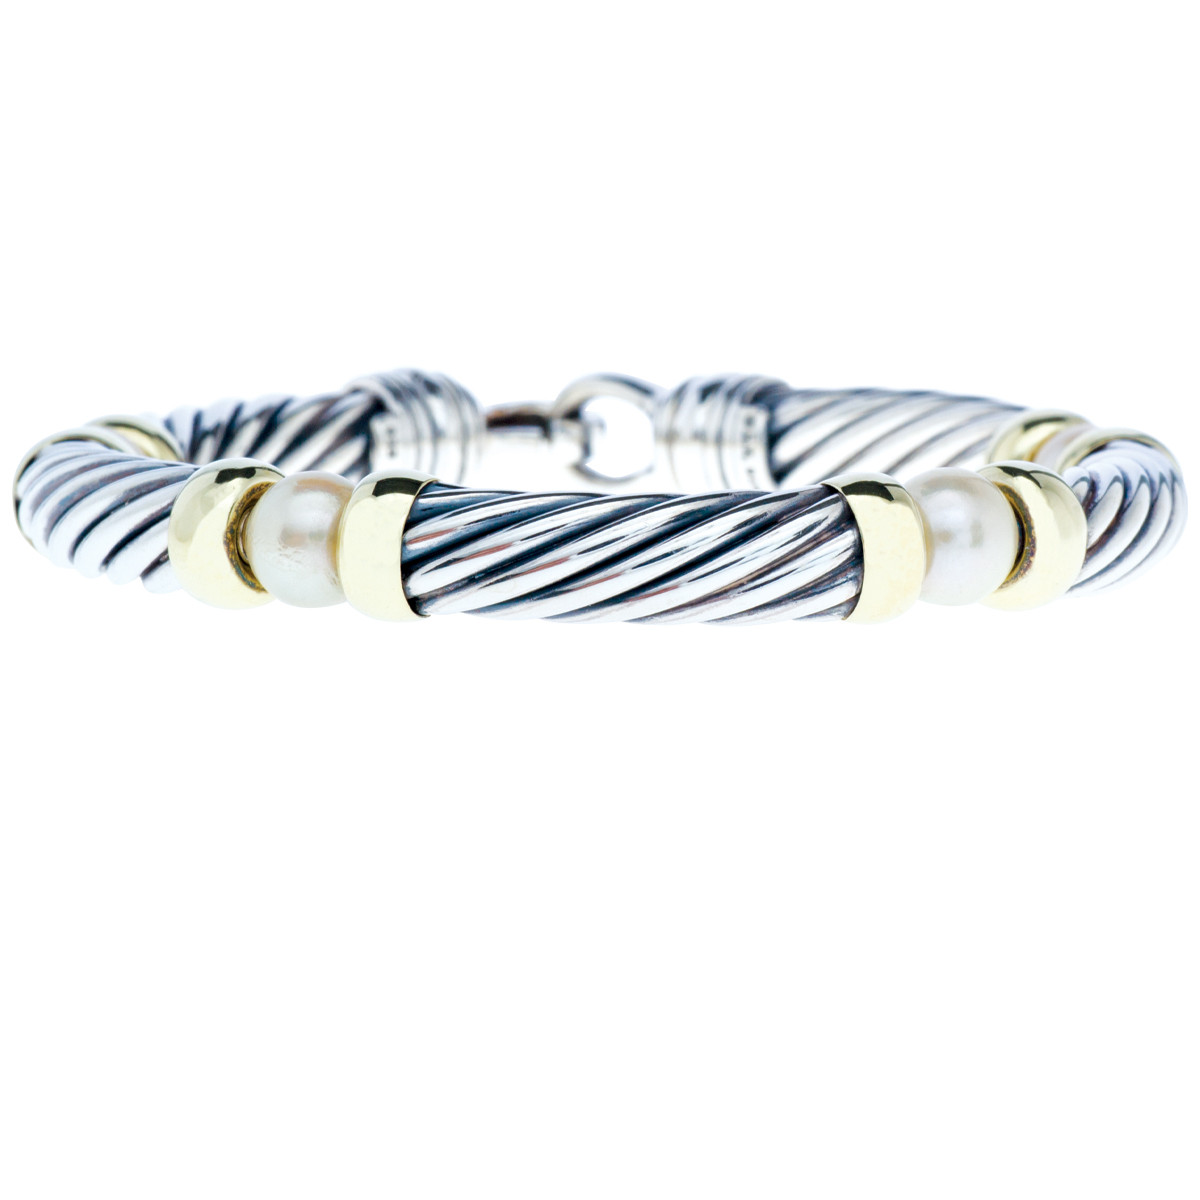 Vintage David Yurman Pearl Cable Bracelet